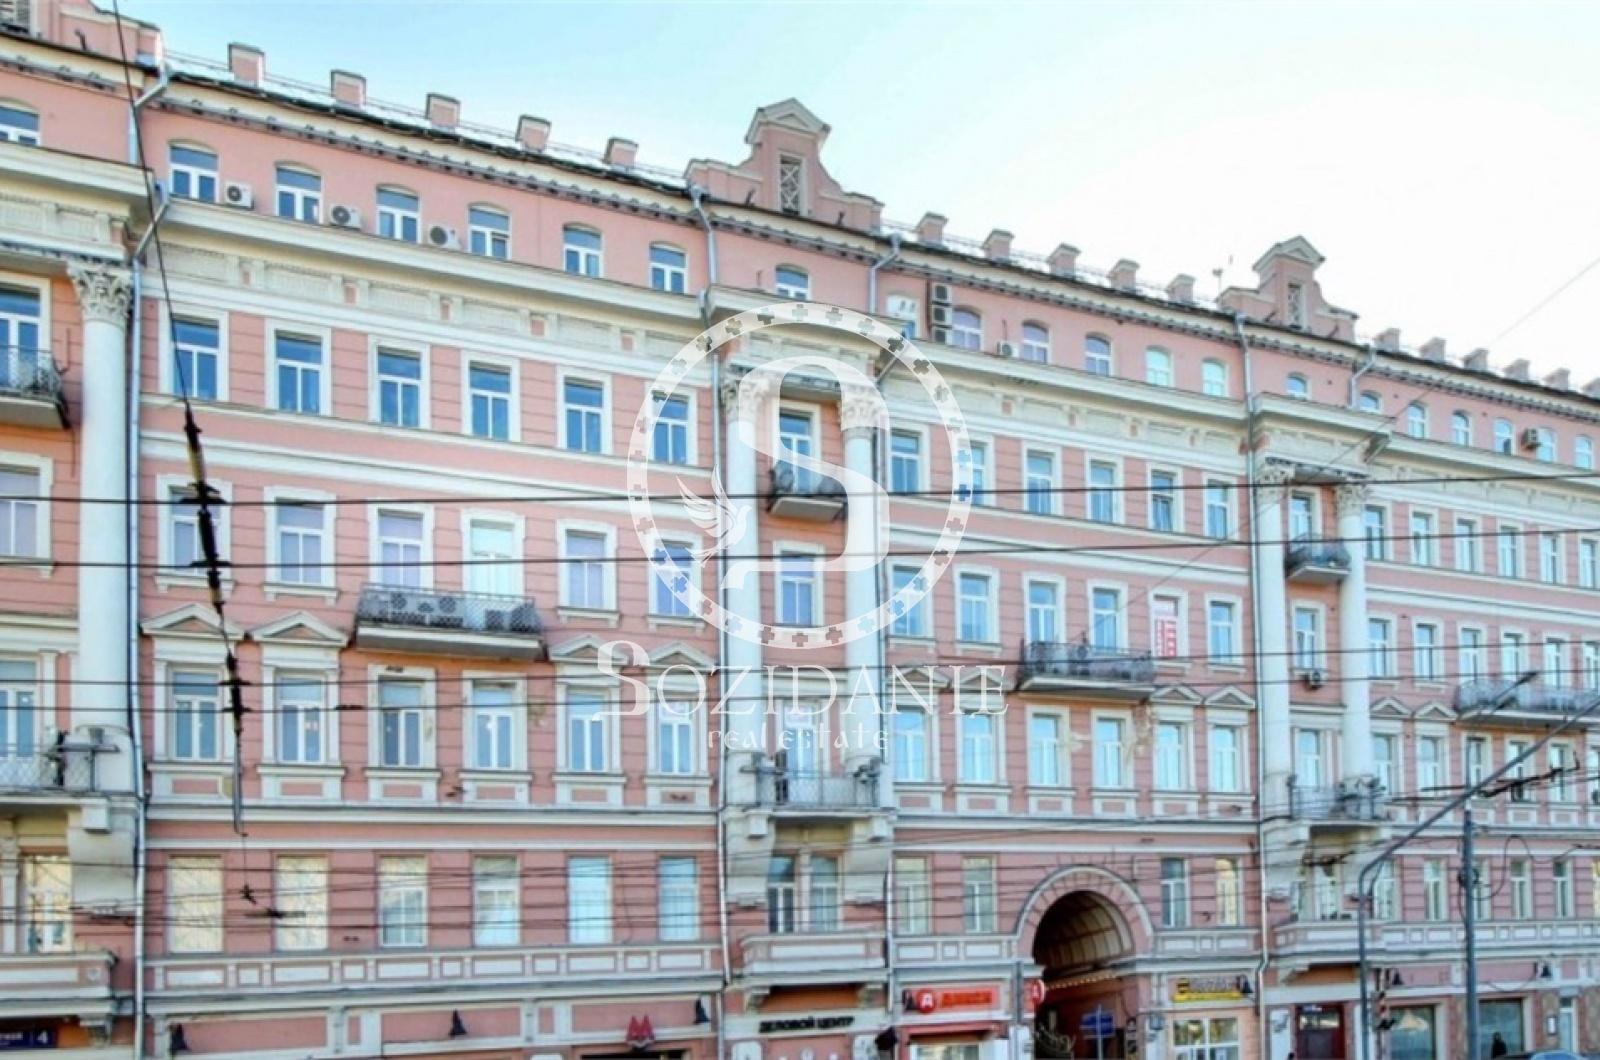 4 Комнаты, Городская, Аренда, Страстной бульвар, Listing ID 3587, Москва, Россия,